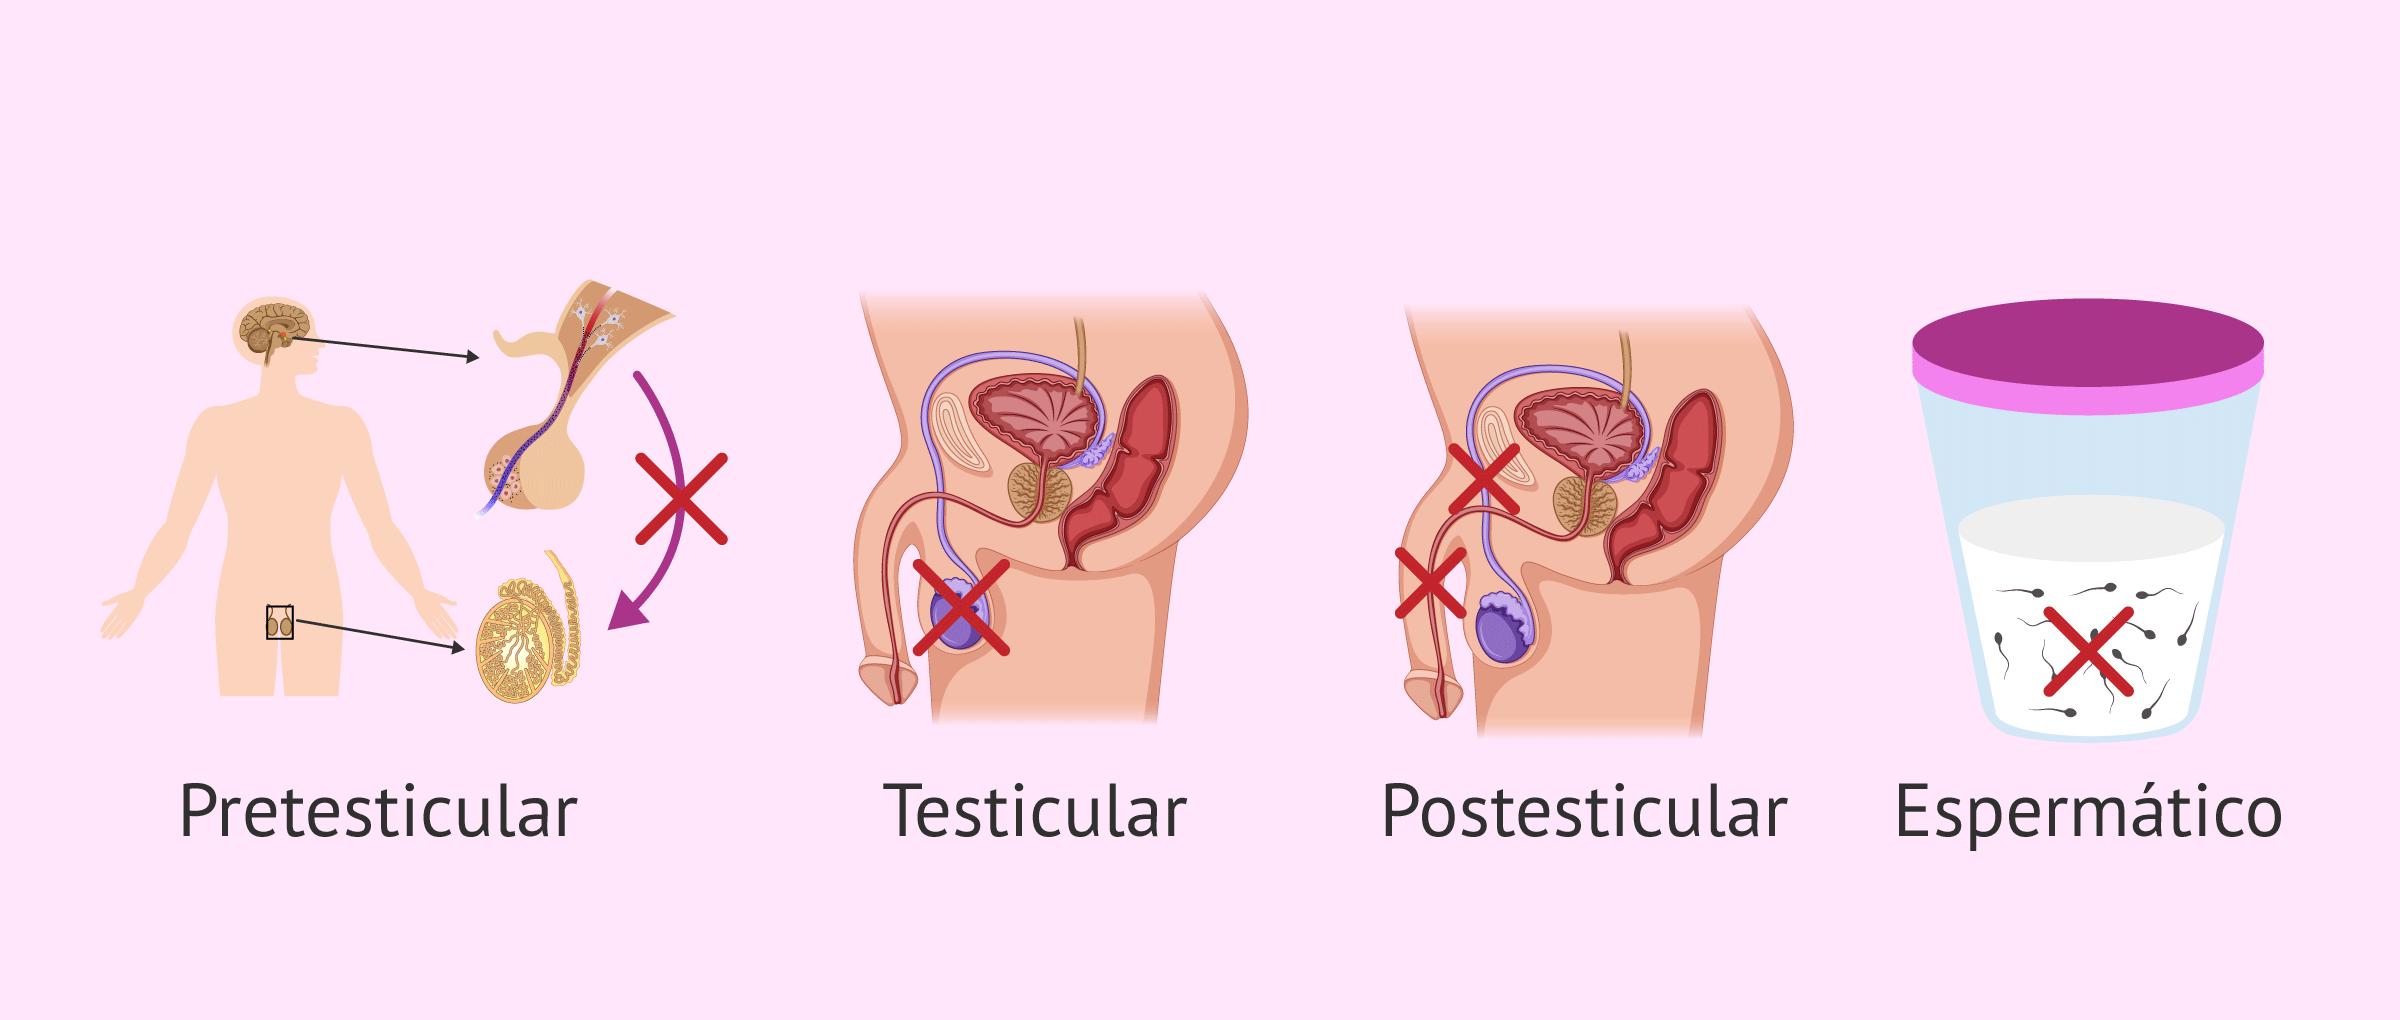 Principales factores afectados en infertilidad masculina